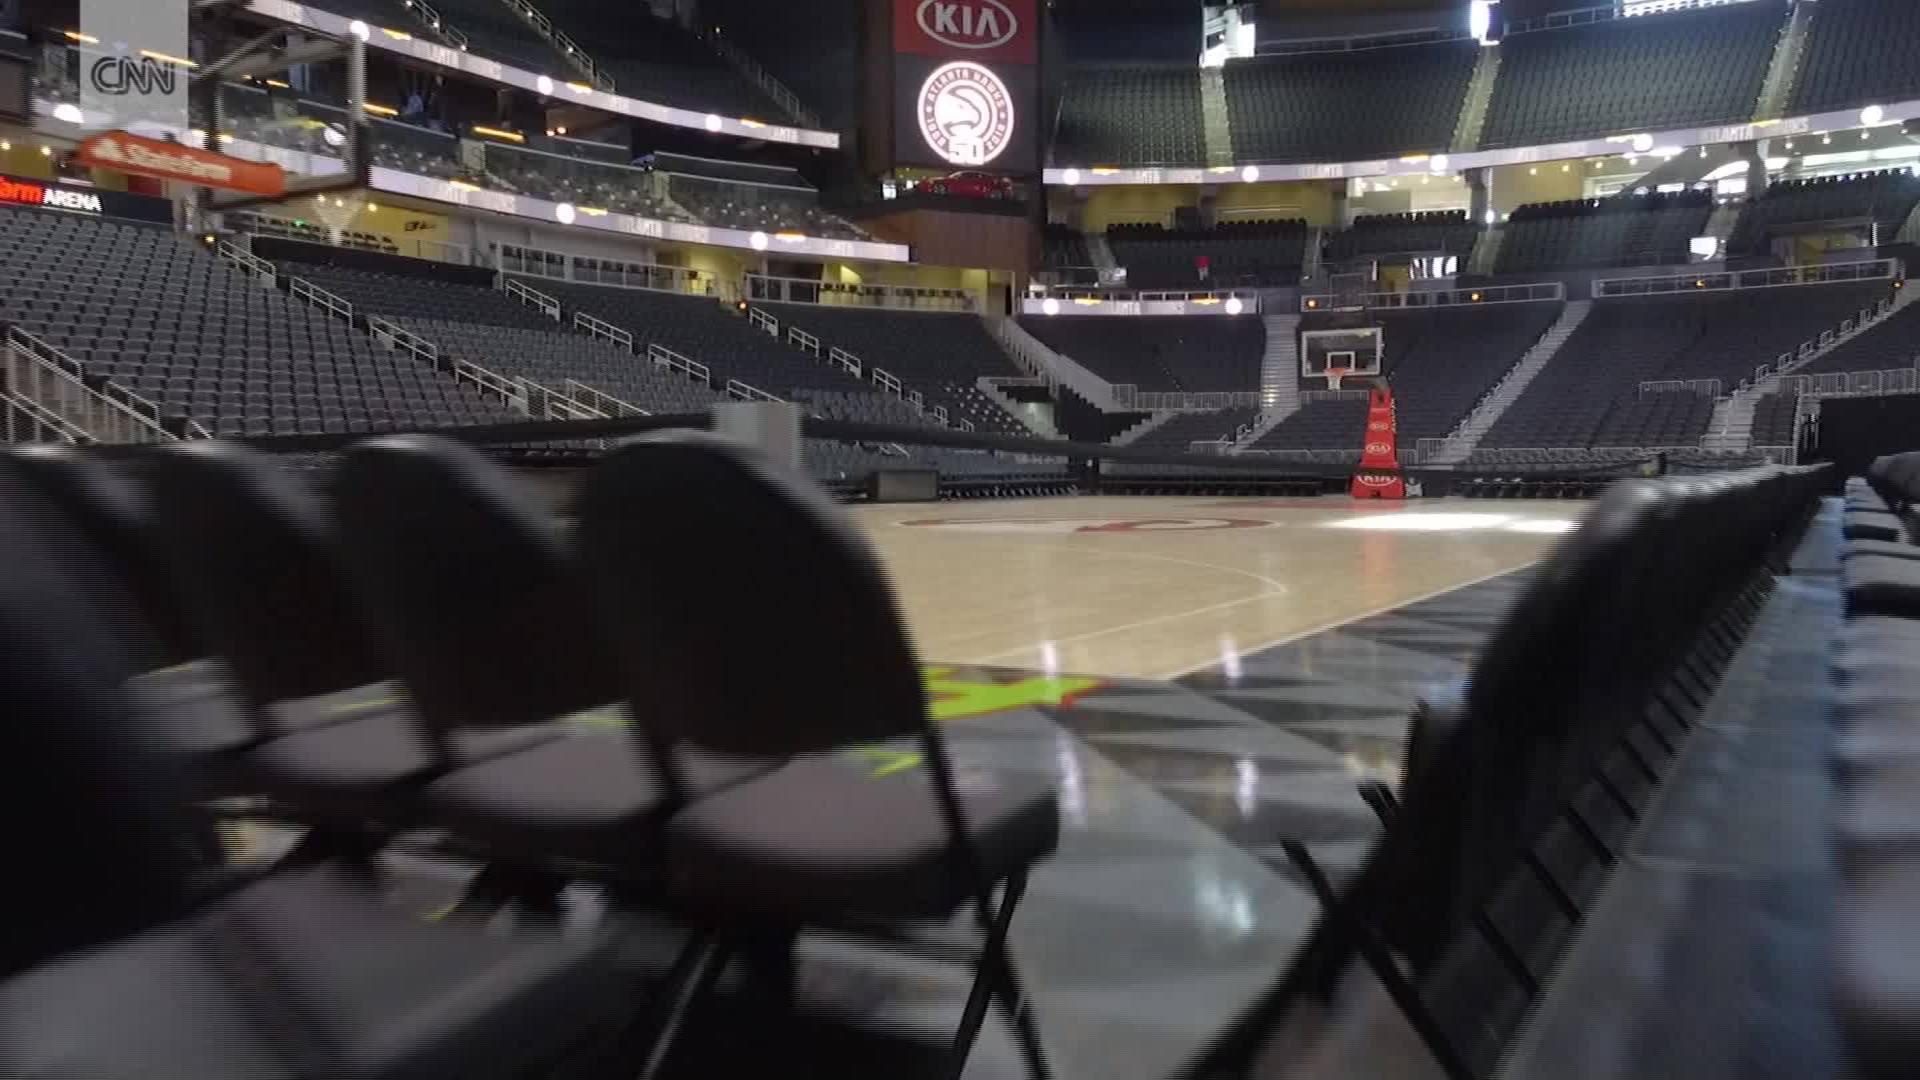 Inside State Farm Arena Cnn Video